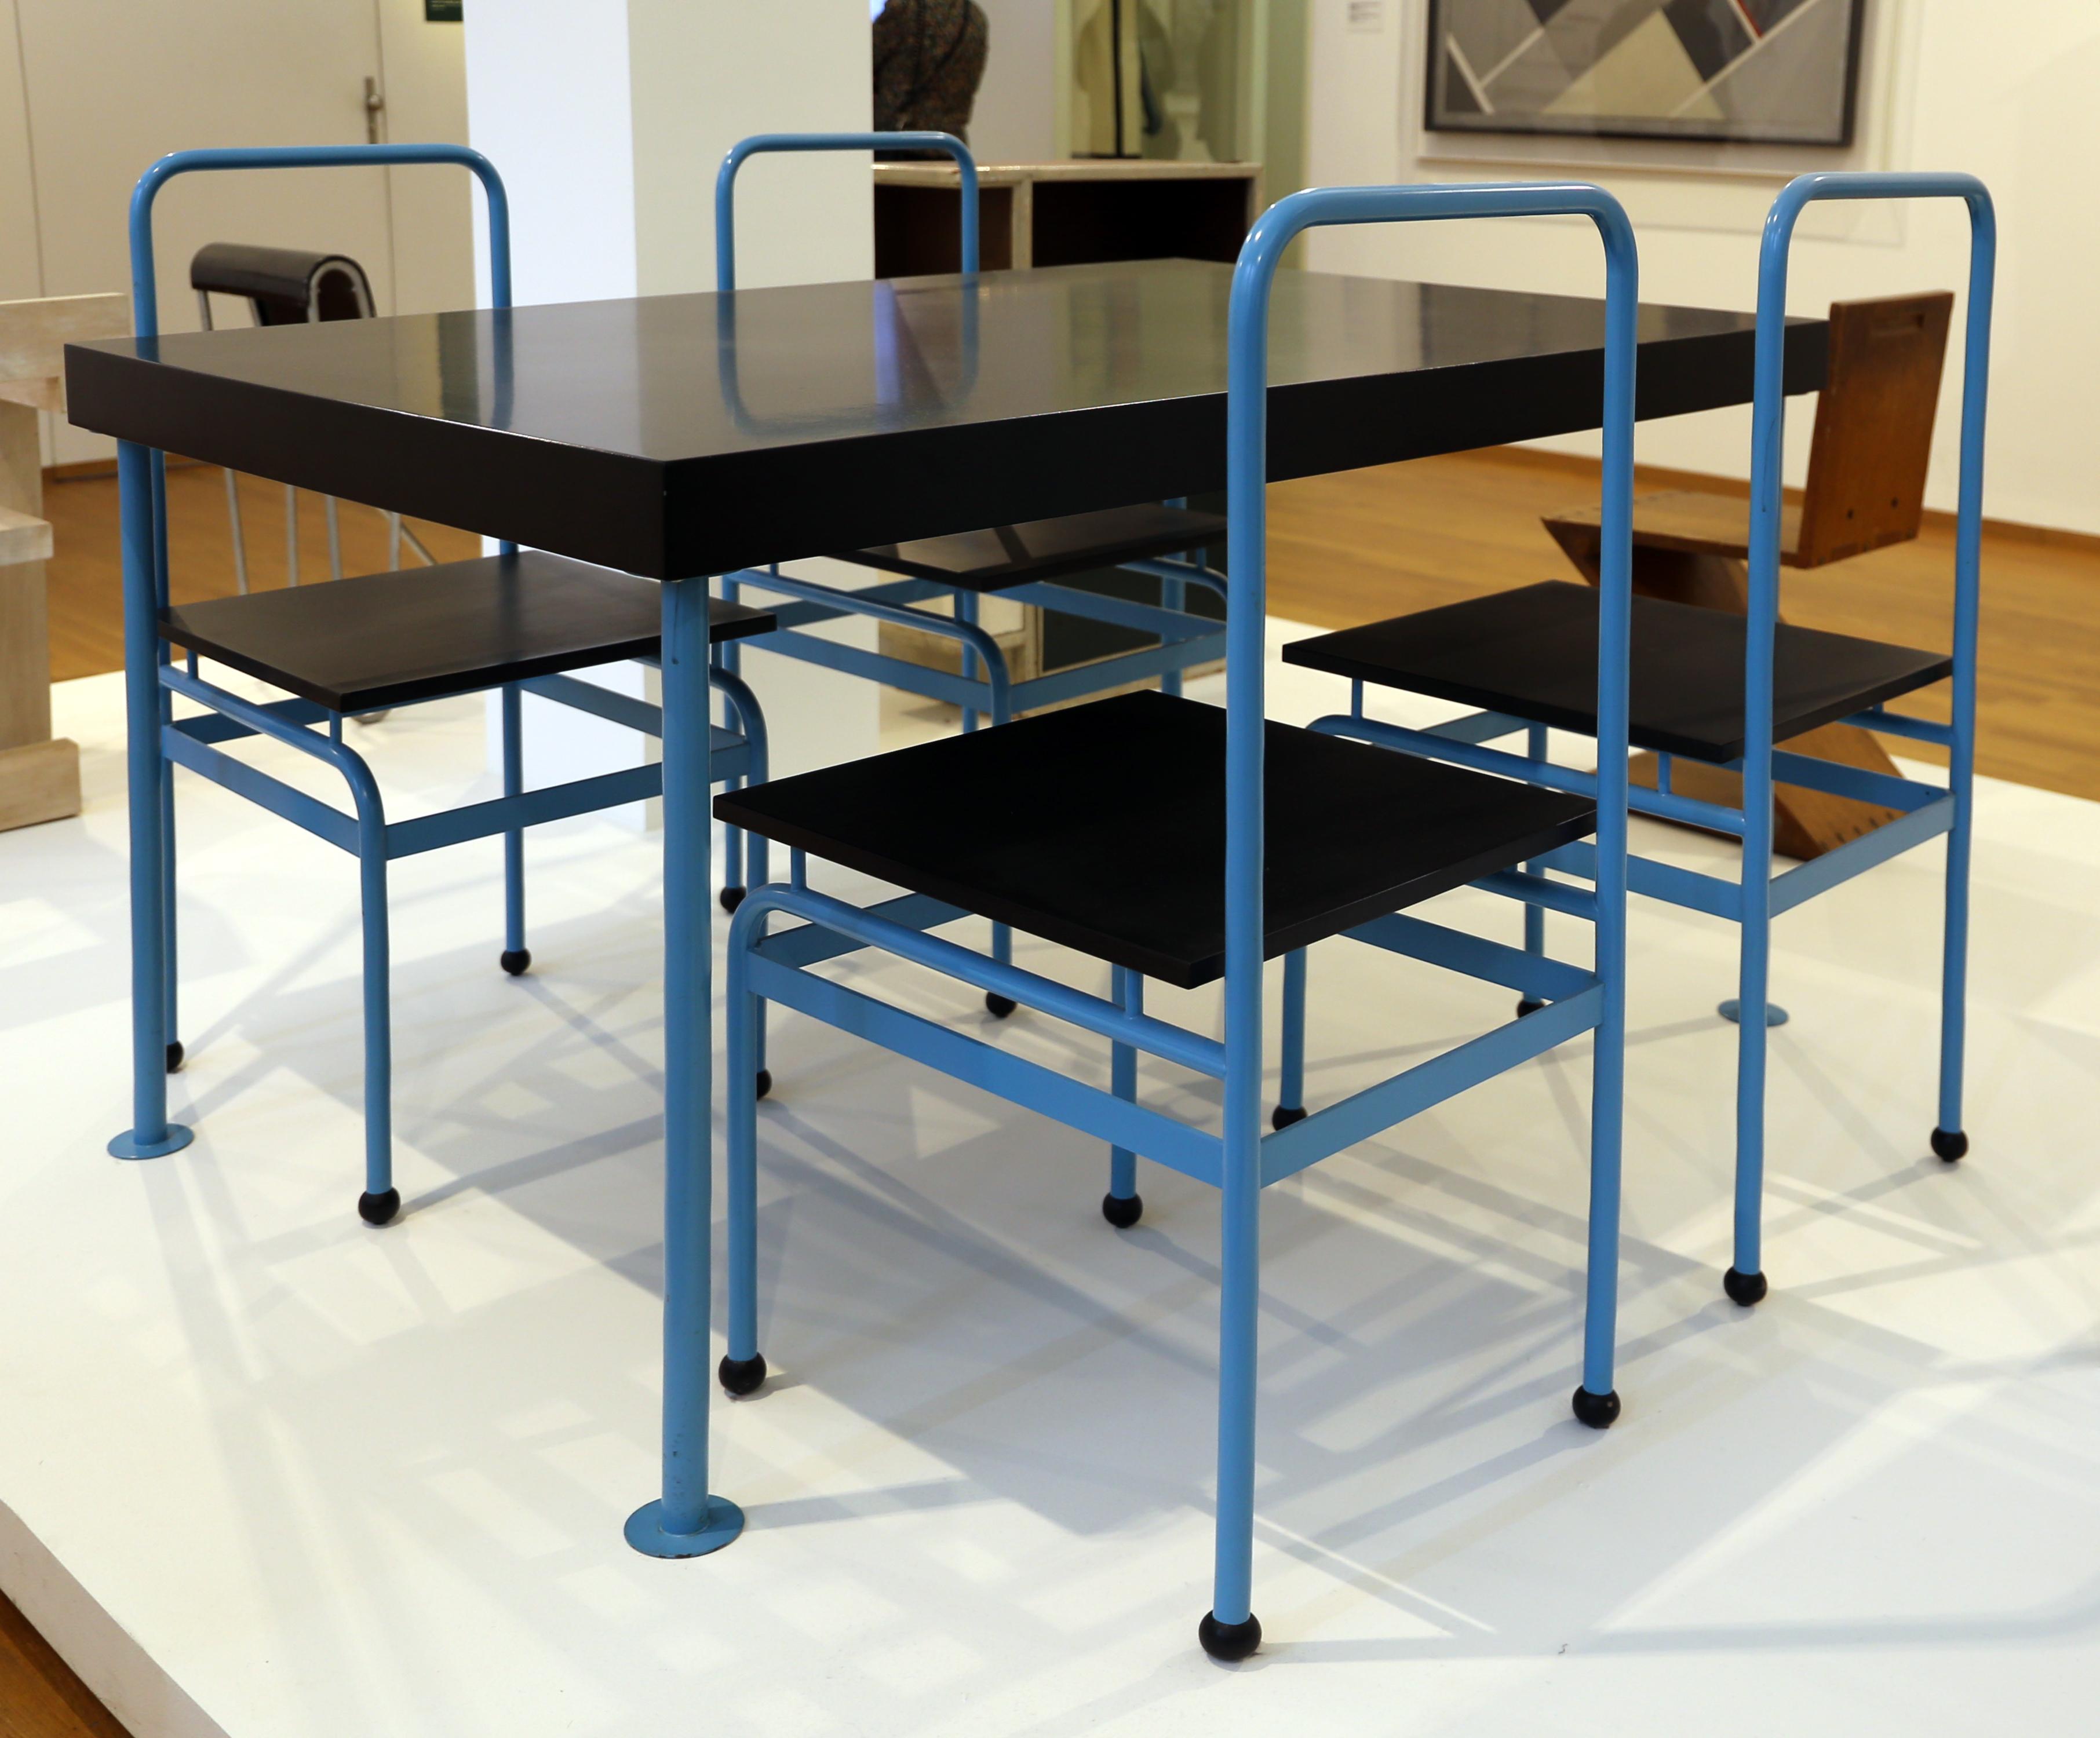 File:J.j.p. oud, tavolo da cucina e sedie per il weissenhofsiedlung ...